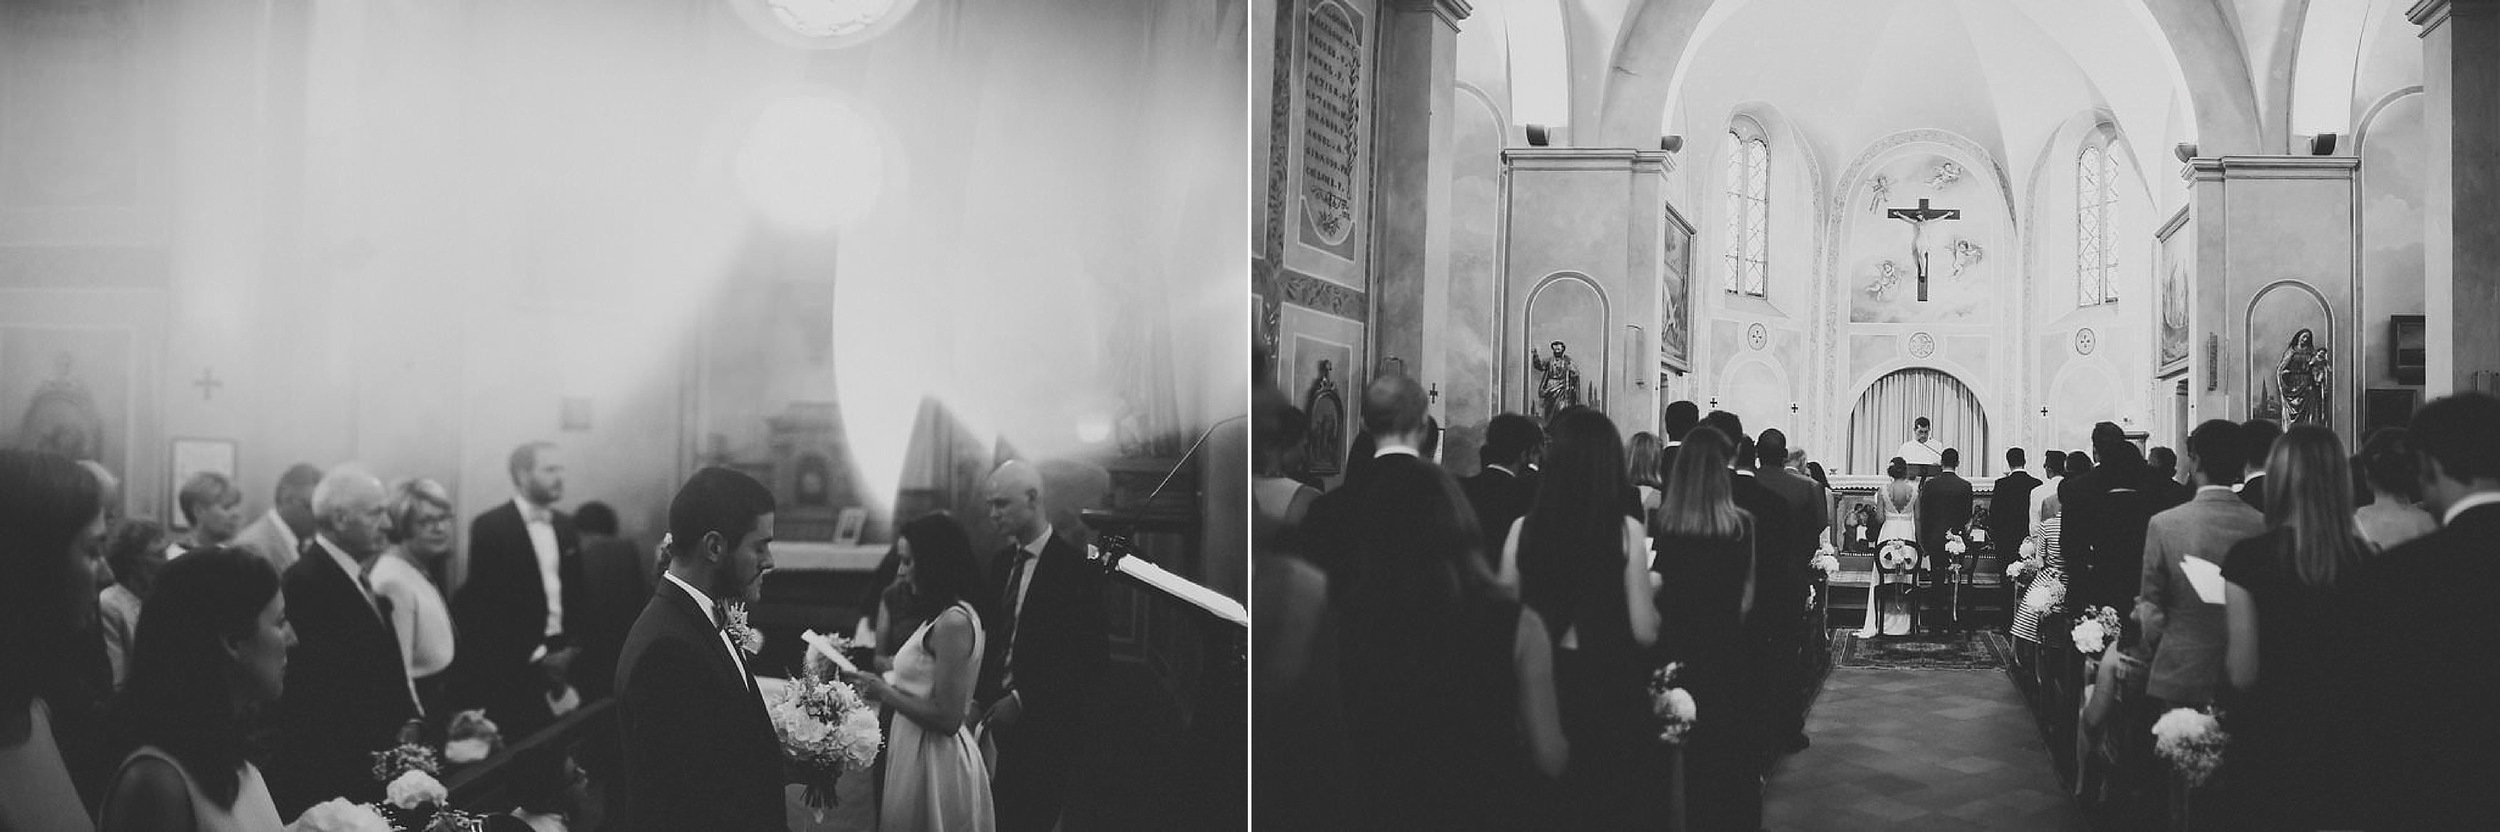 mariage-hyeres-villa-brignac-steven-bassillieaux-bordeaux-dordogne-wedding-photographe89.jpg